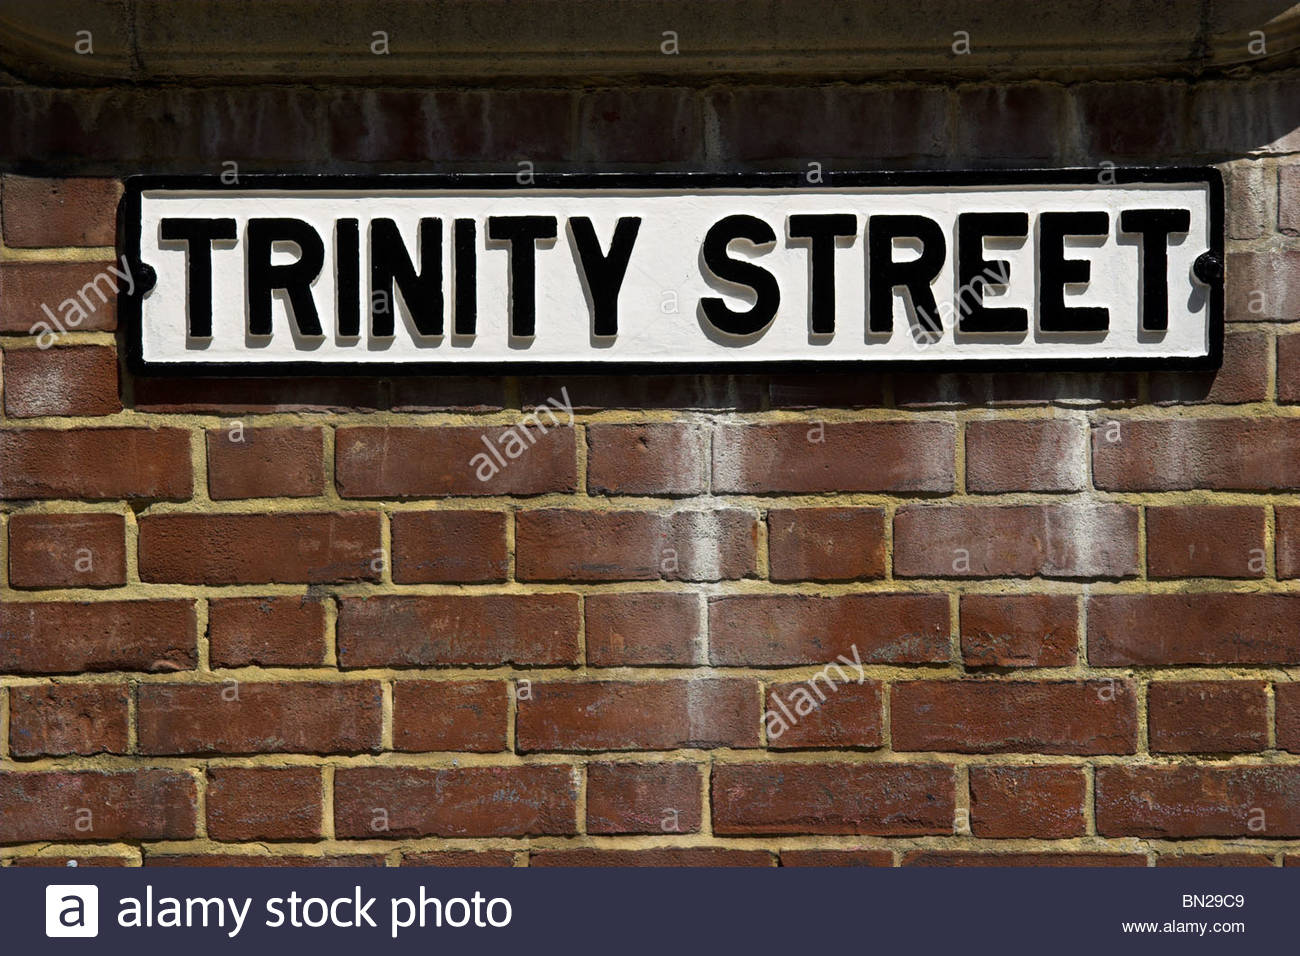 'Trinity Street' street sign, Bristol, England, UK. - Stock Image